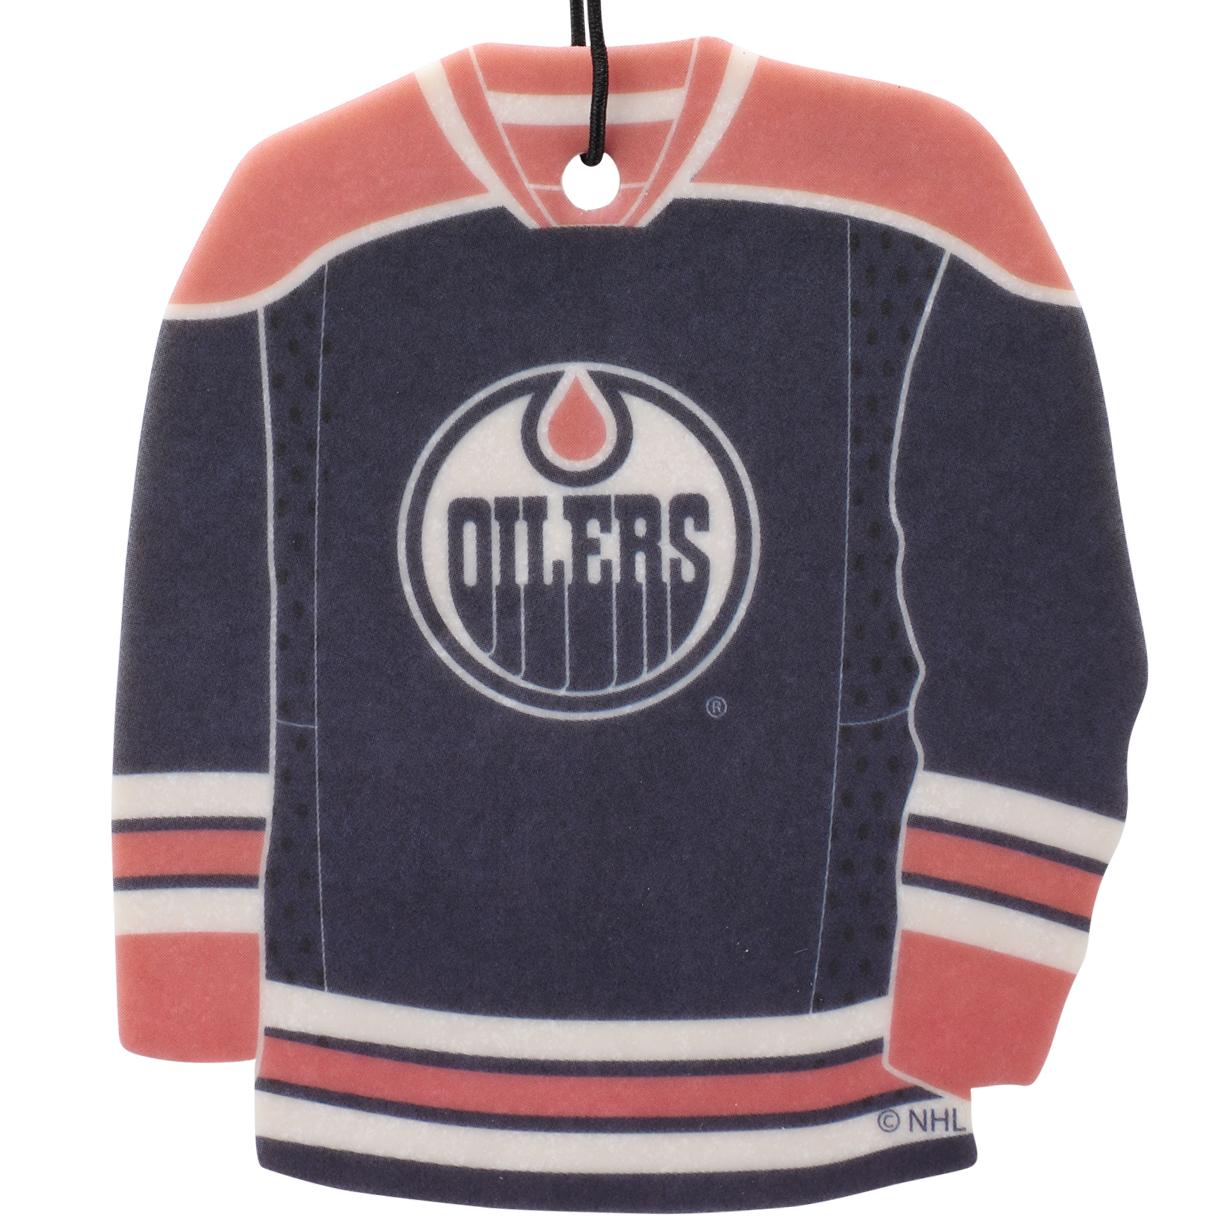 Edmonton Oilers Air Freshener - No Size